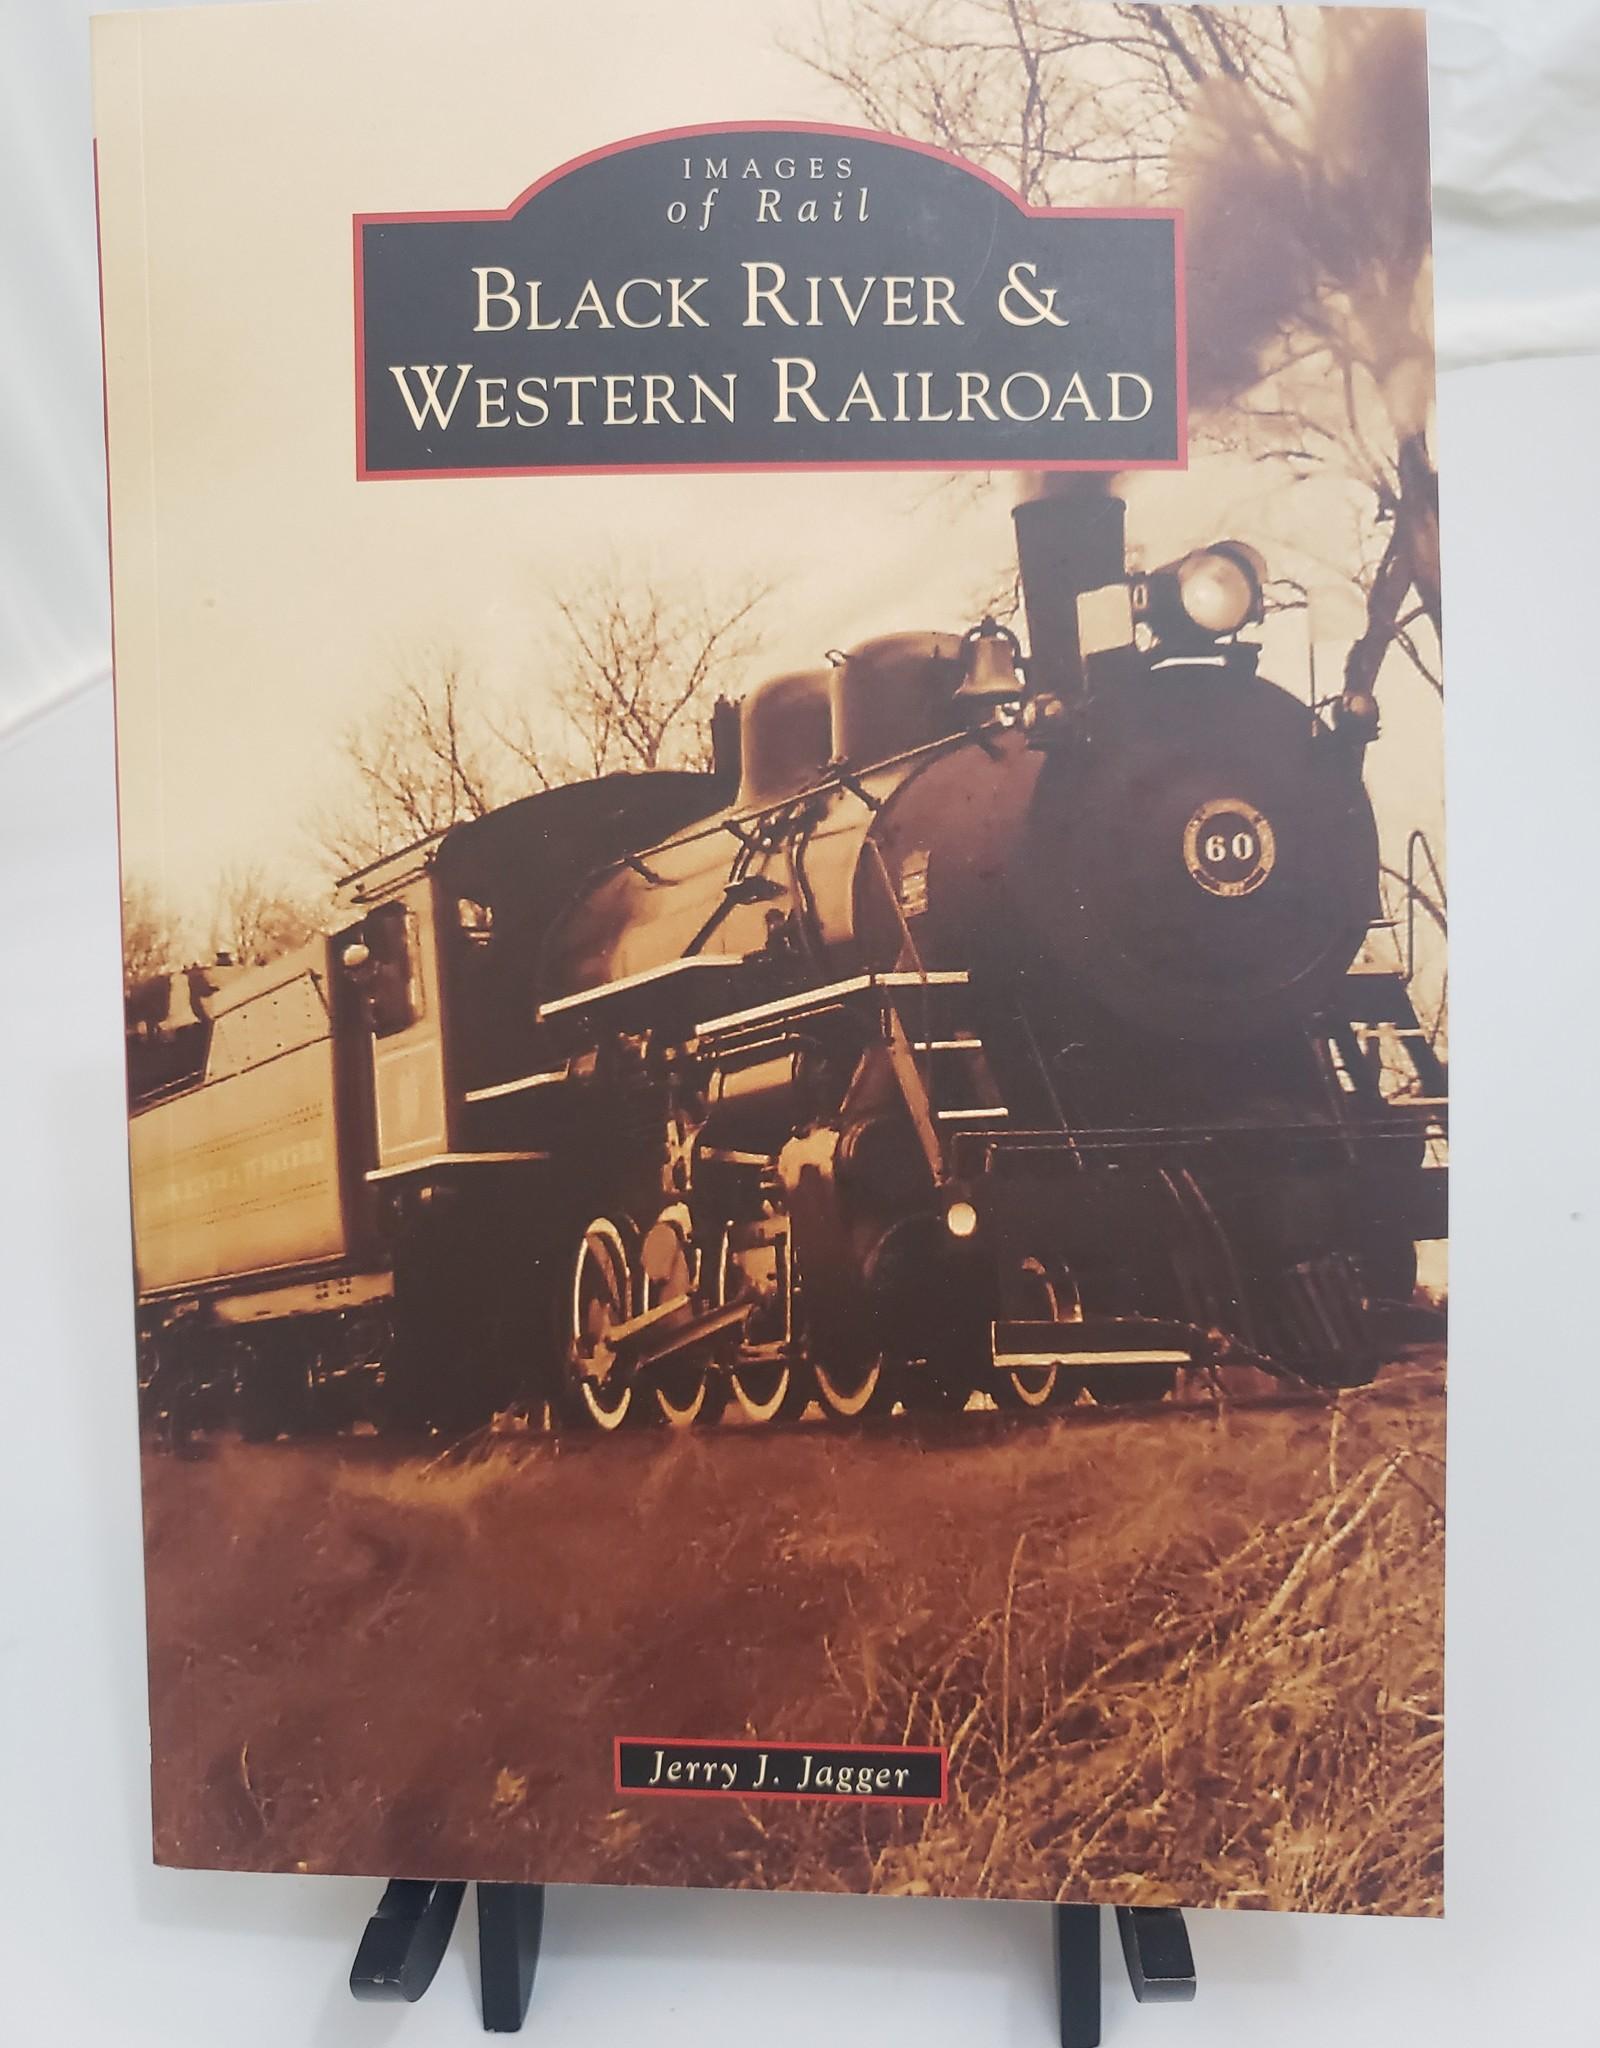 BR&W RR History Book